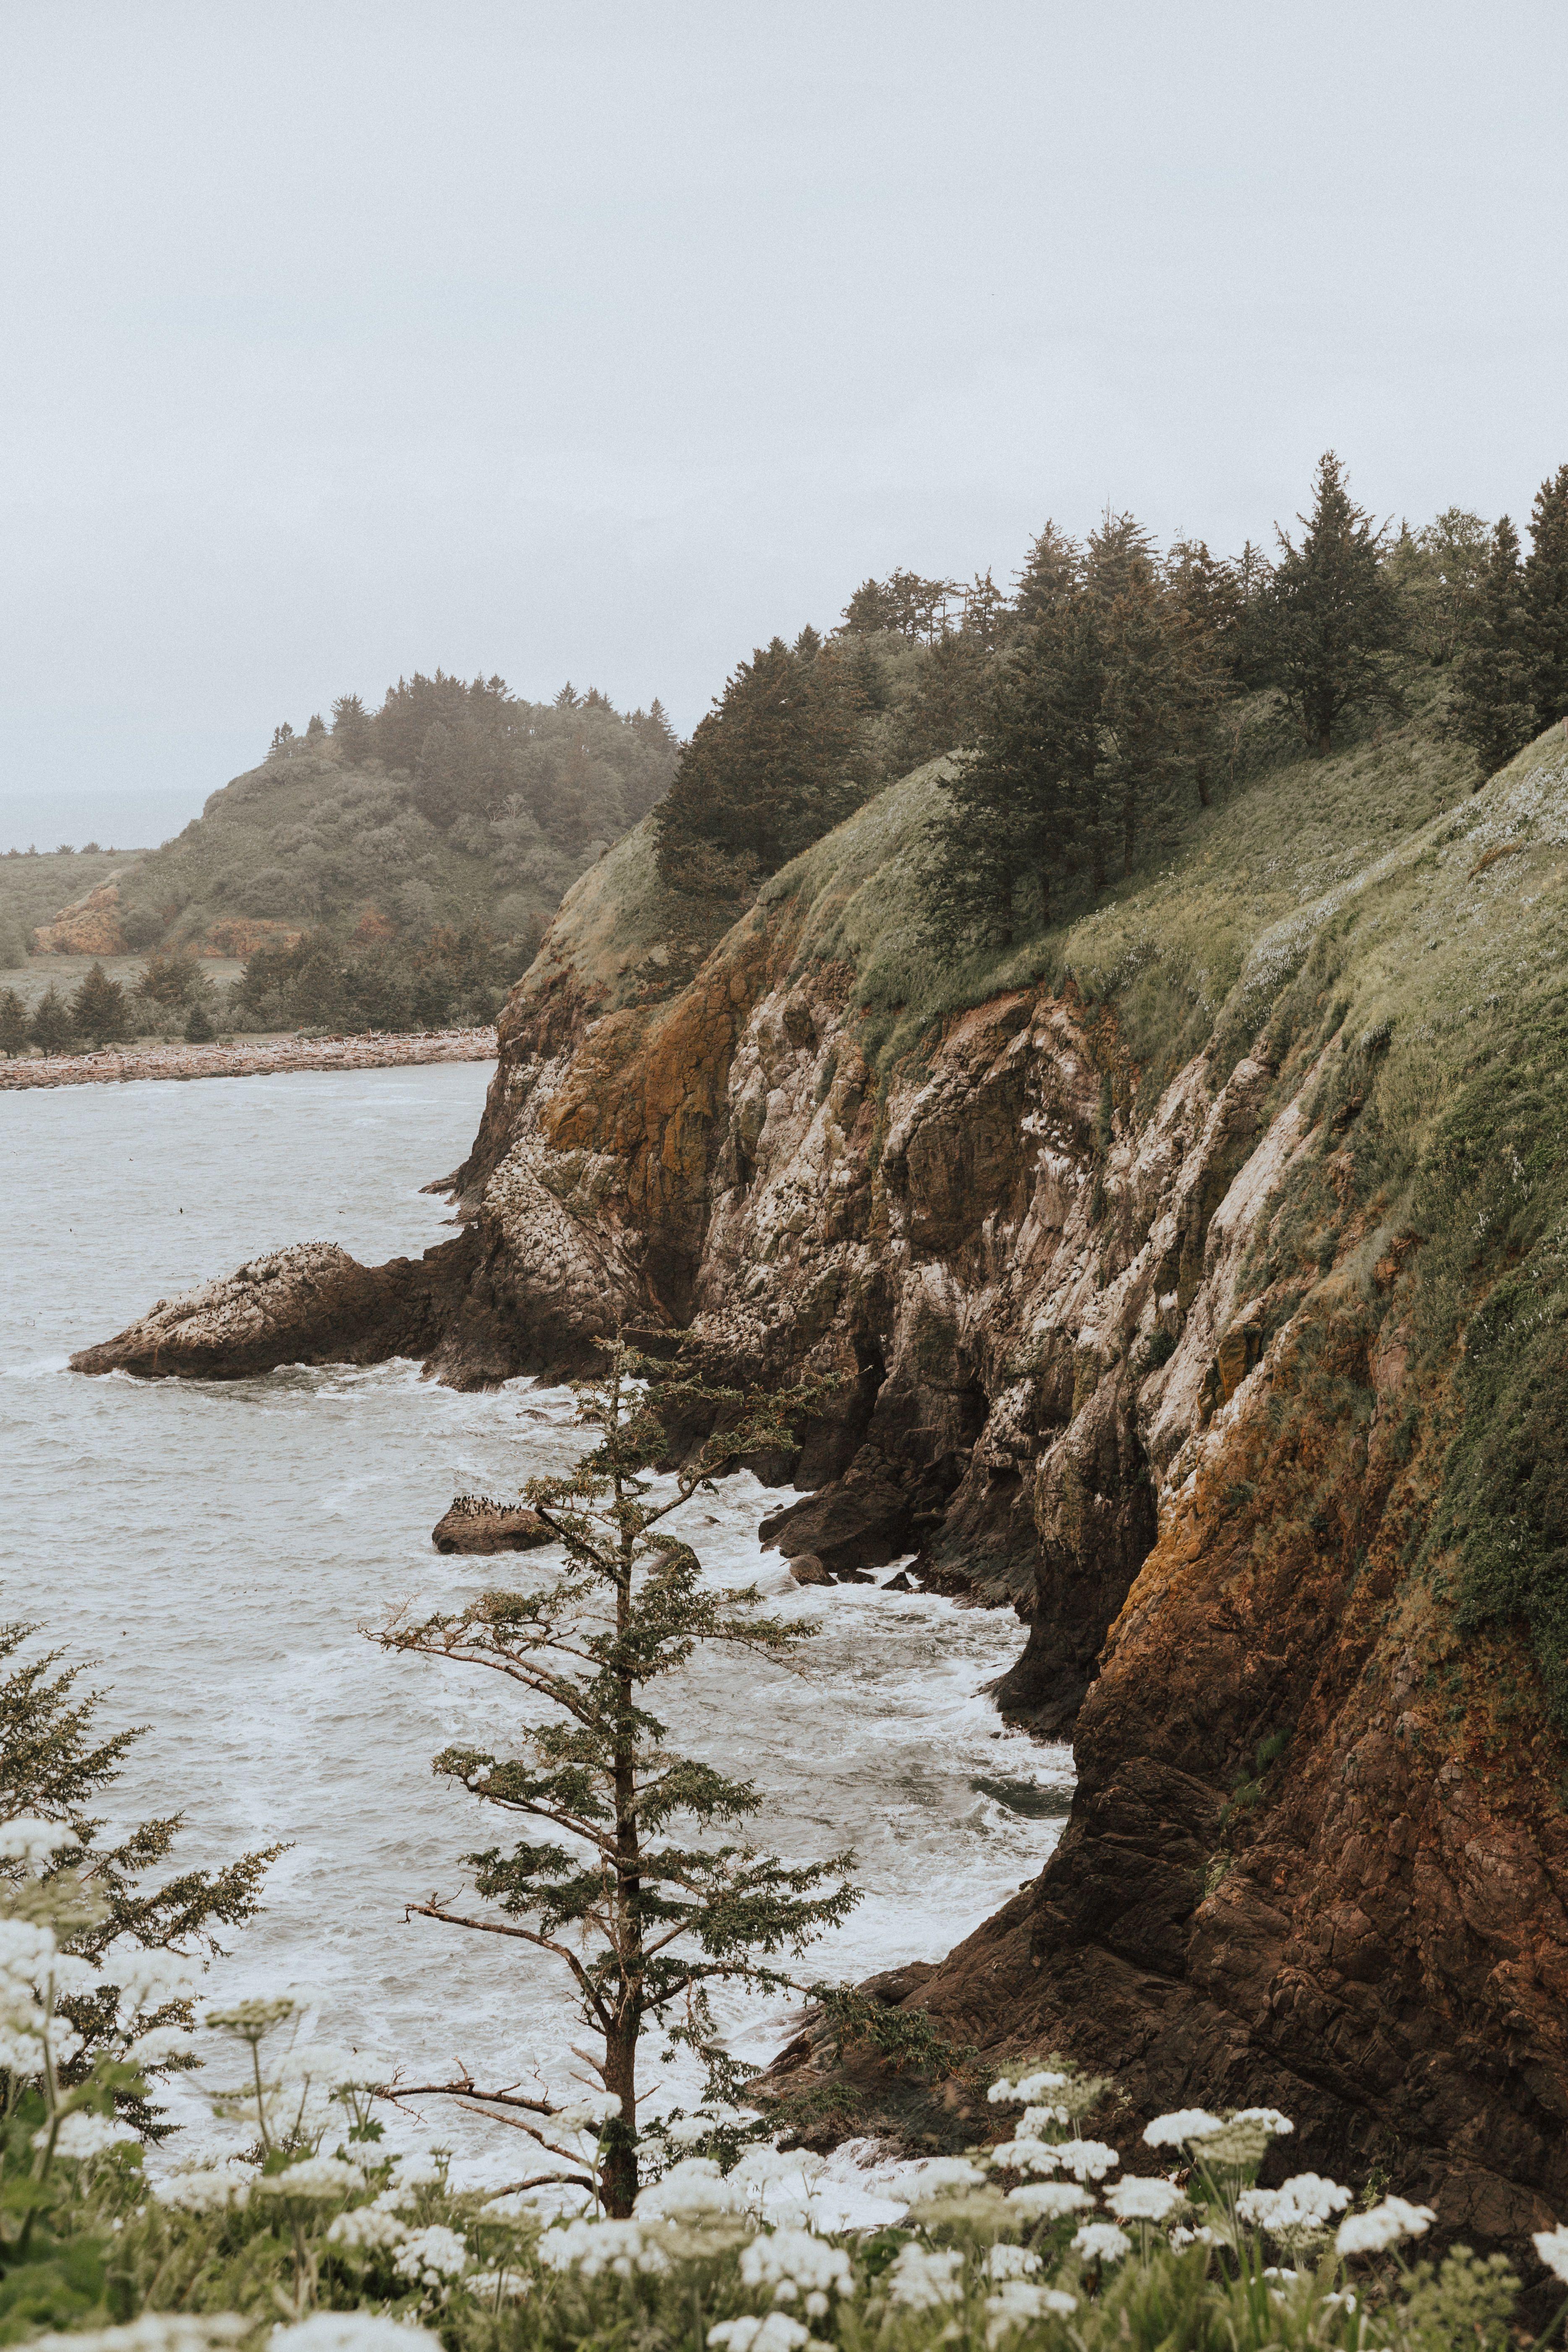 10 Stunning Washington Beaches To Make You Drive To The Coast Right Now - The Mandagies